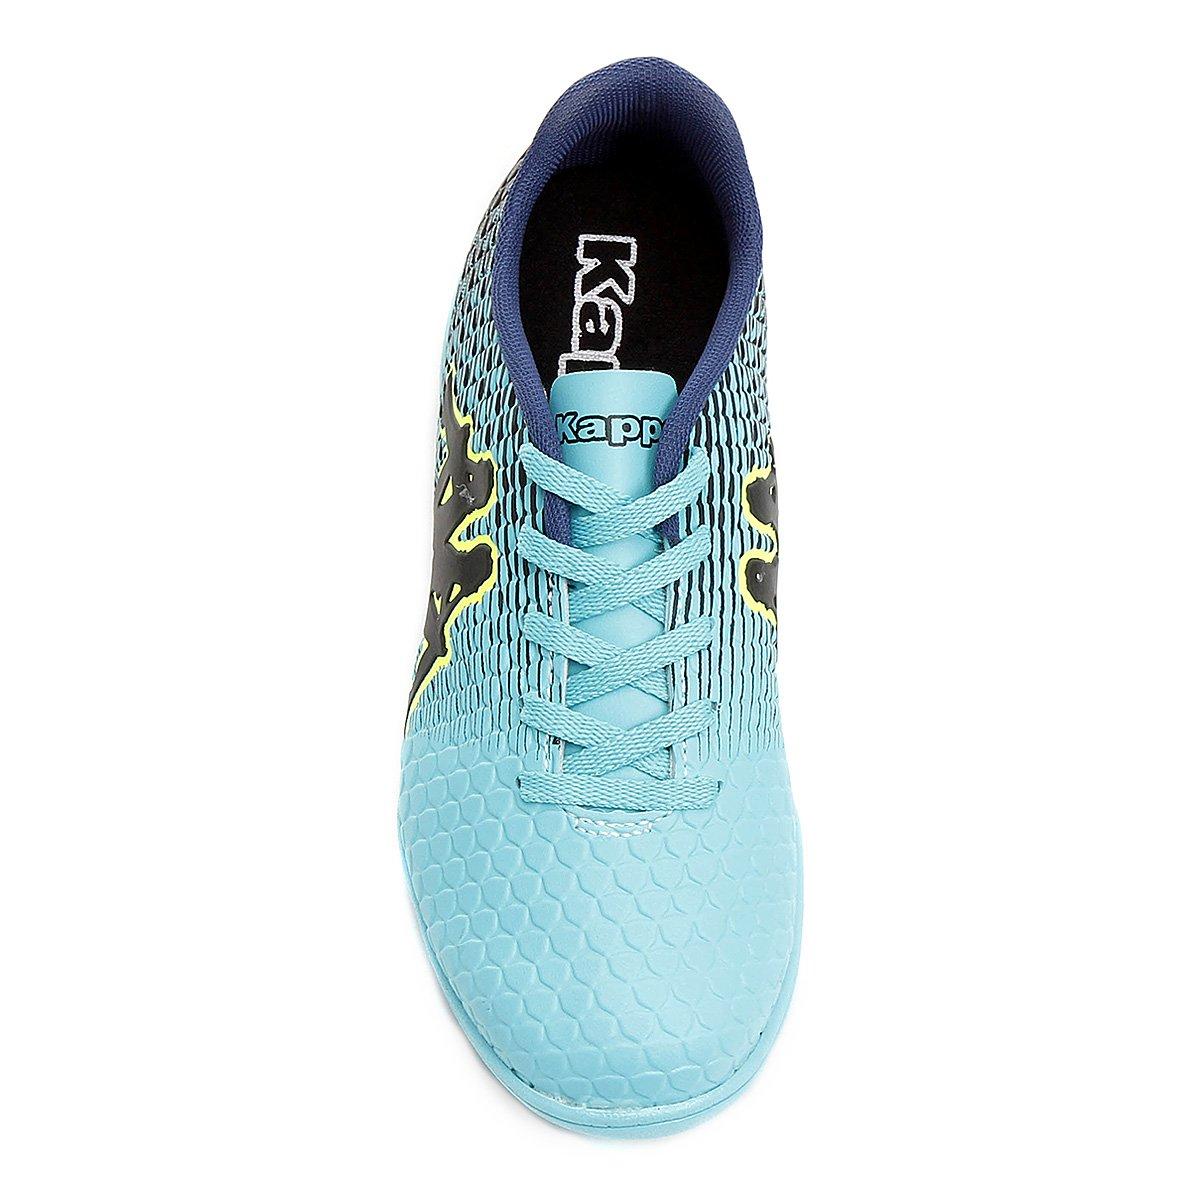 Chuteira Futsal Infantil Kappa Fortore - Azul Claro e Preto 5610d44af81d8